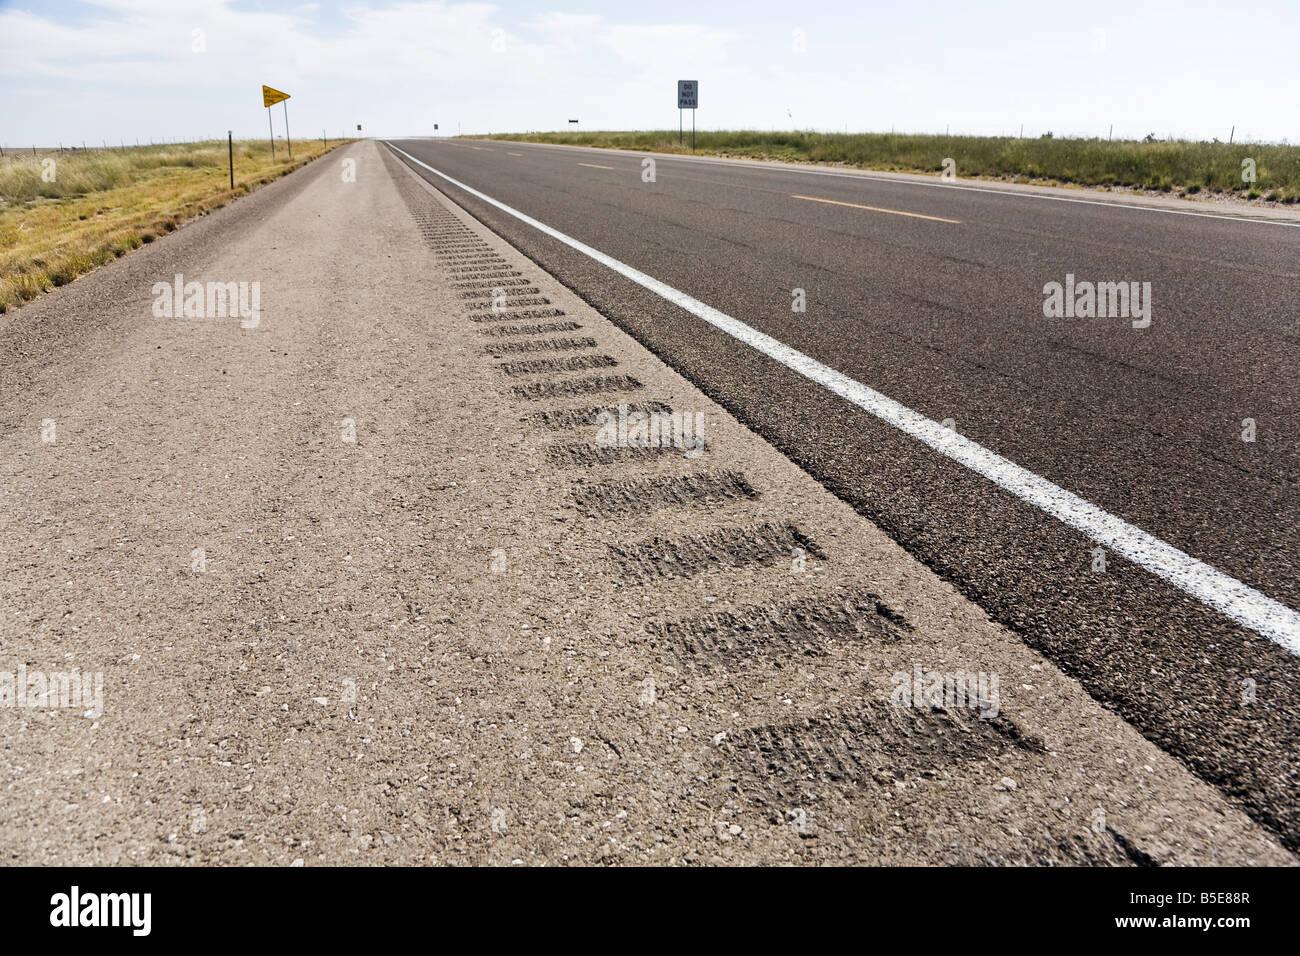 Roadway shoulder rumble strips, USA Stock Photo